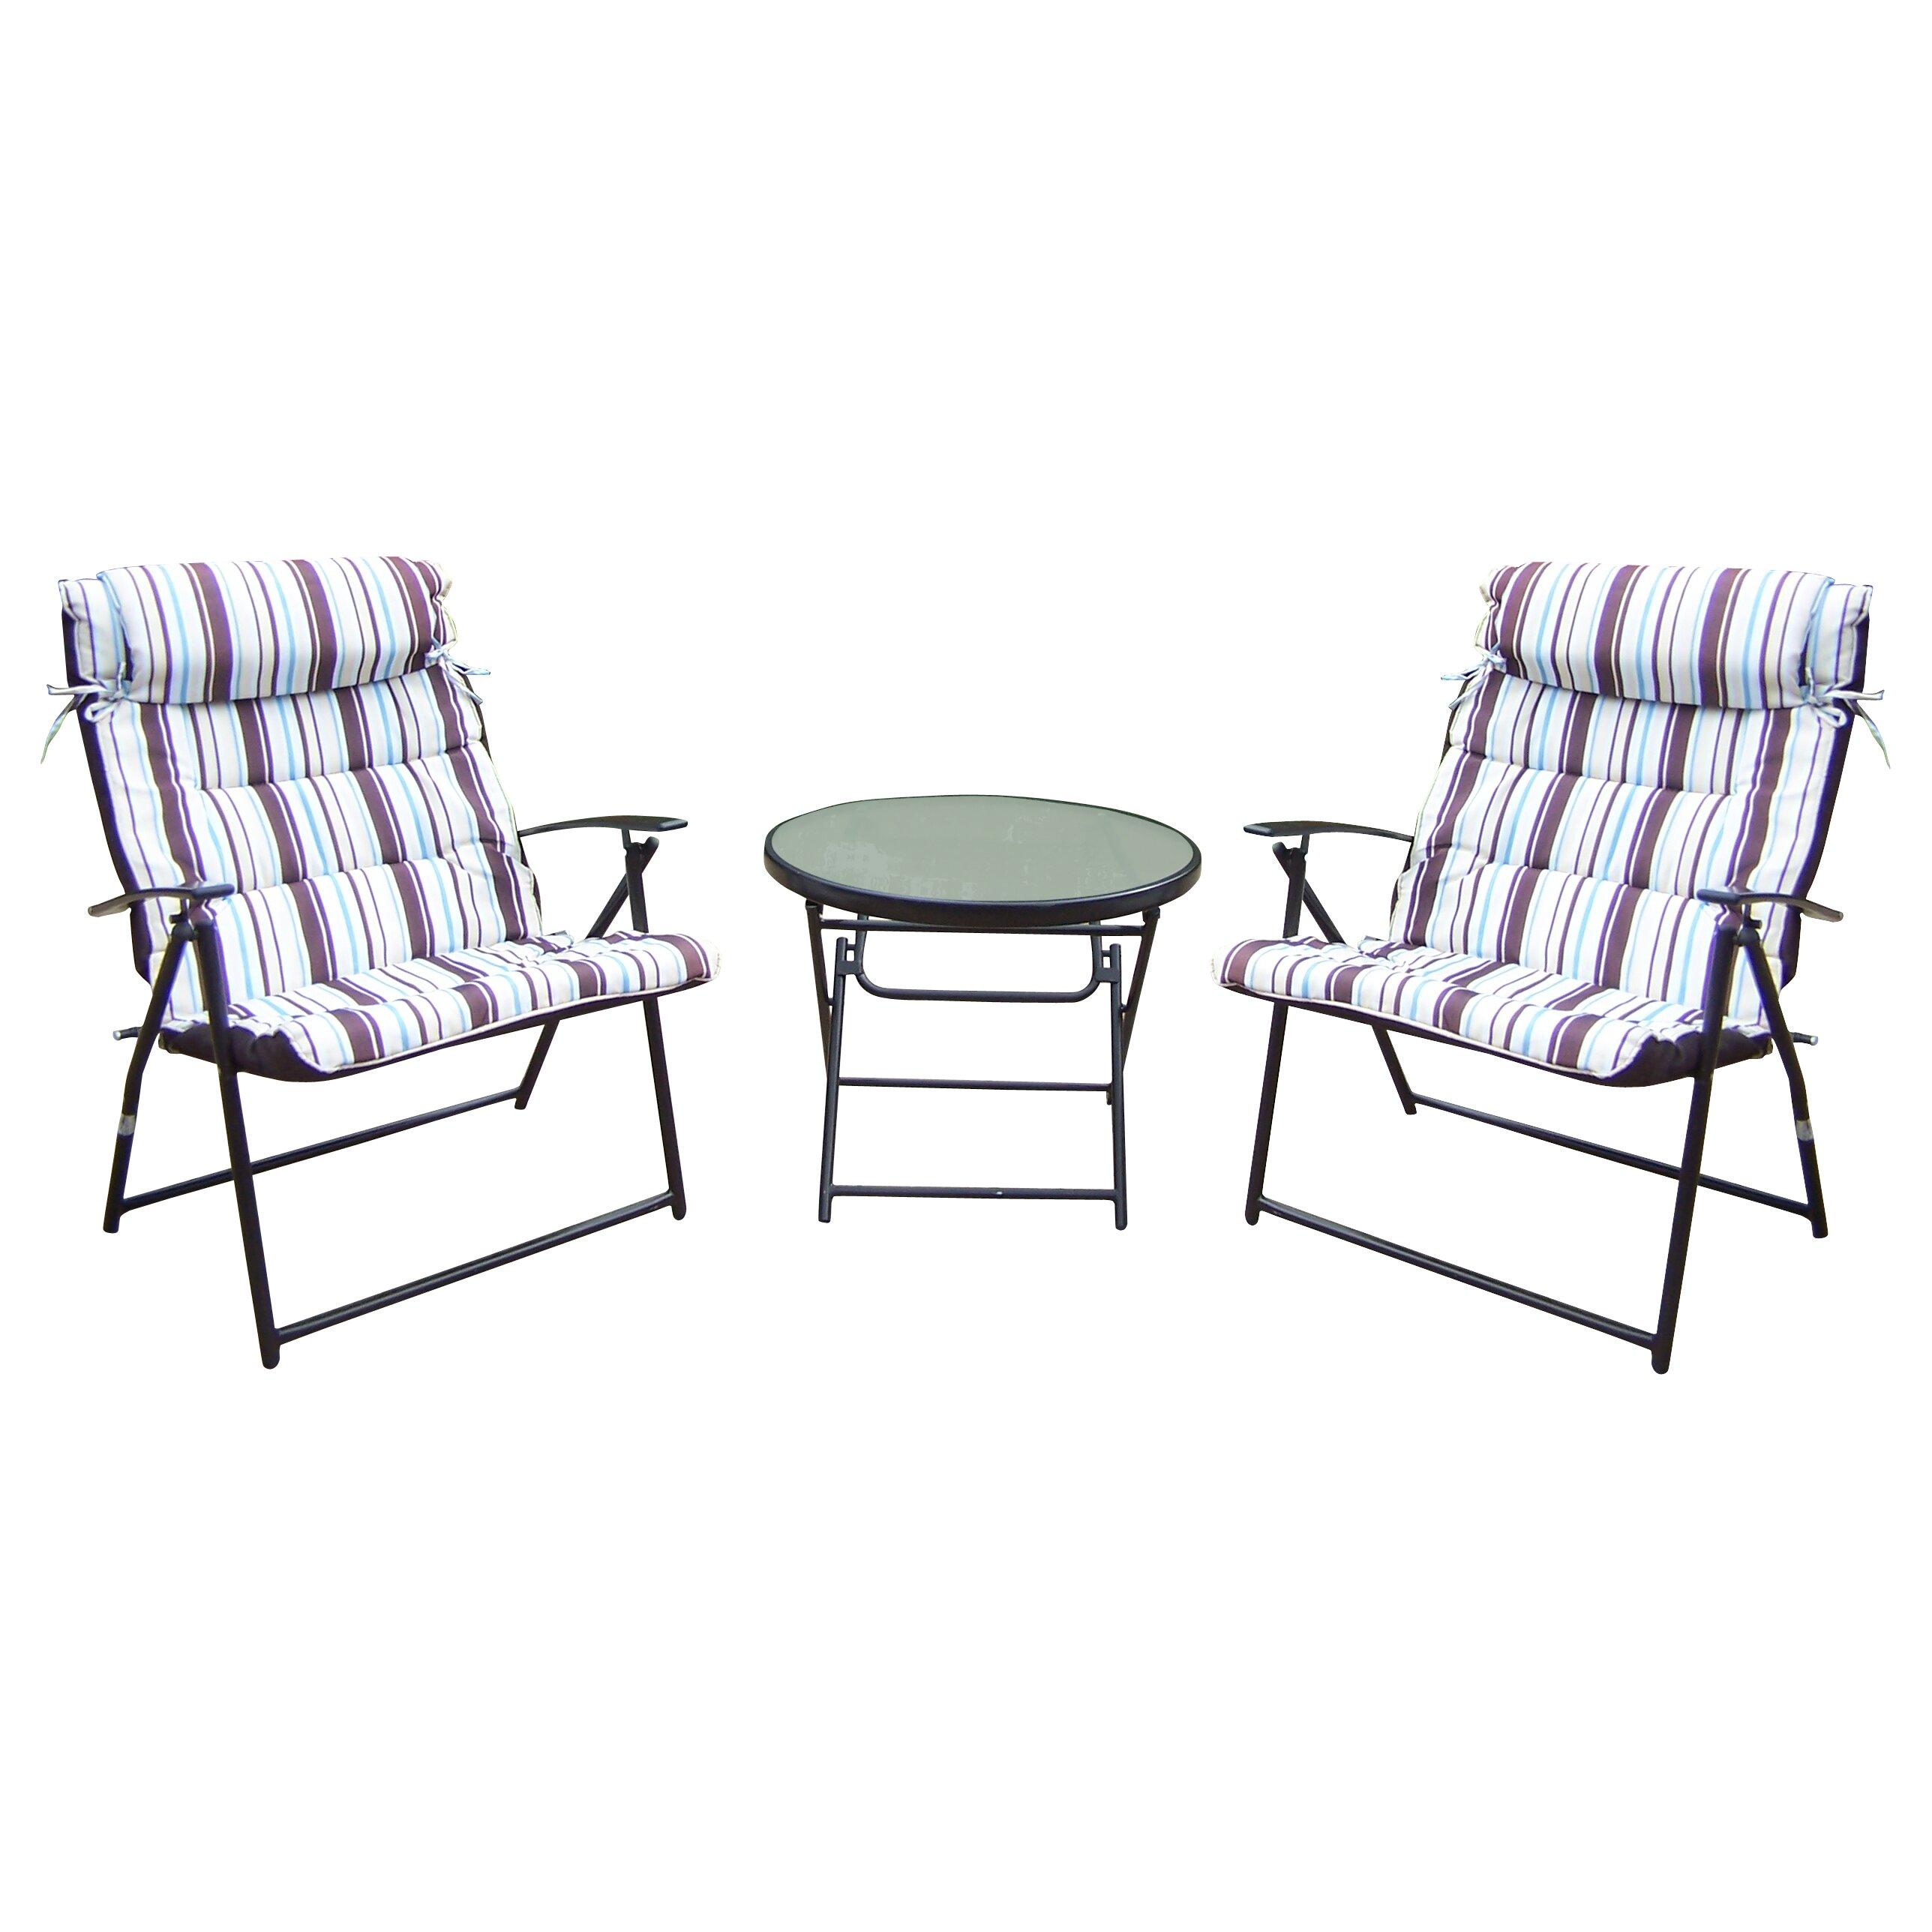 oakland living 3 piece folding bistro set reviews wayfair. Black Bedroom Furniture Sets. Home Design Ideas